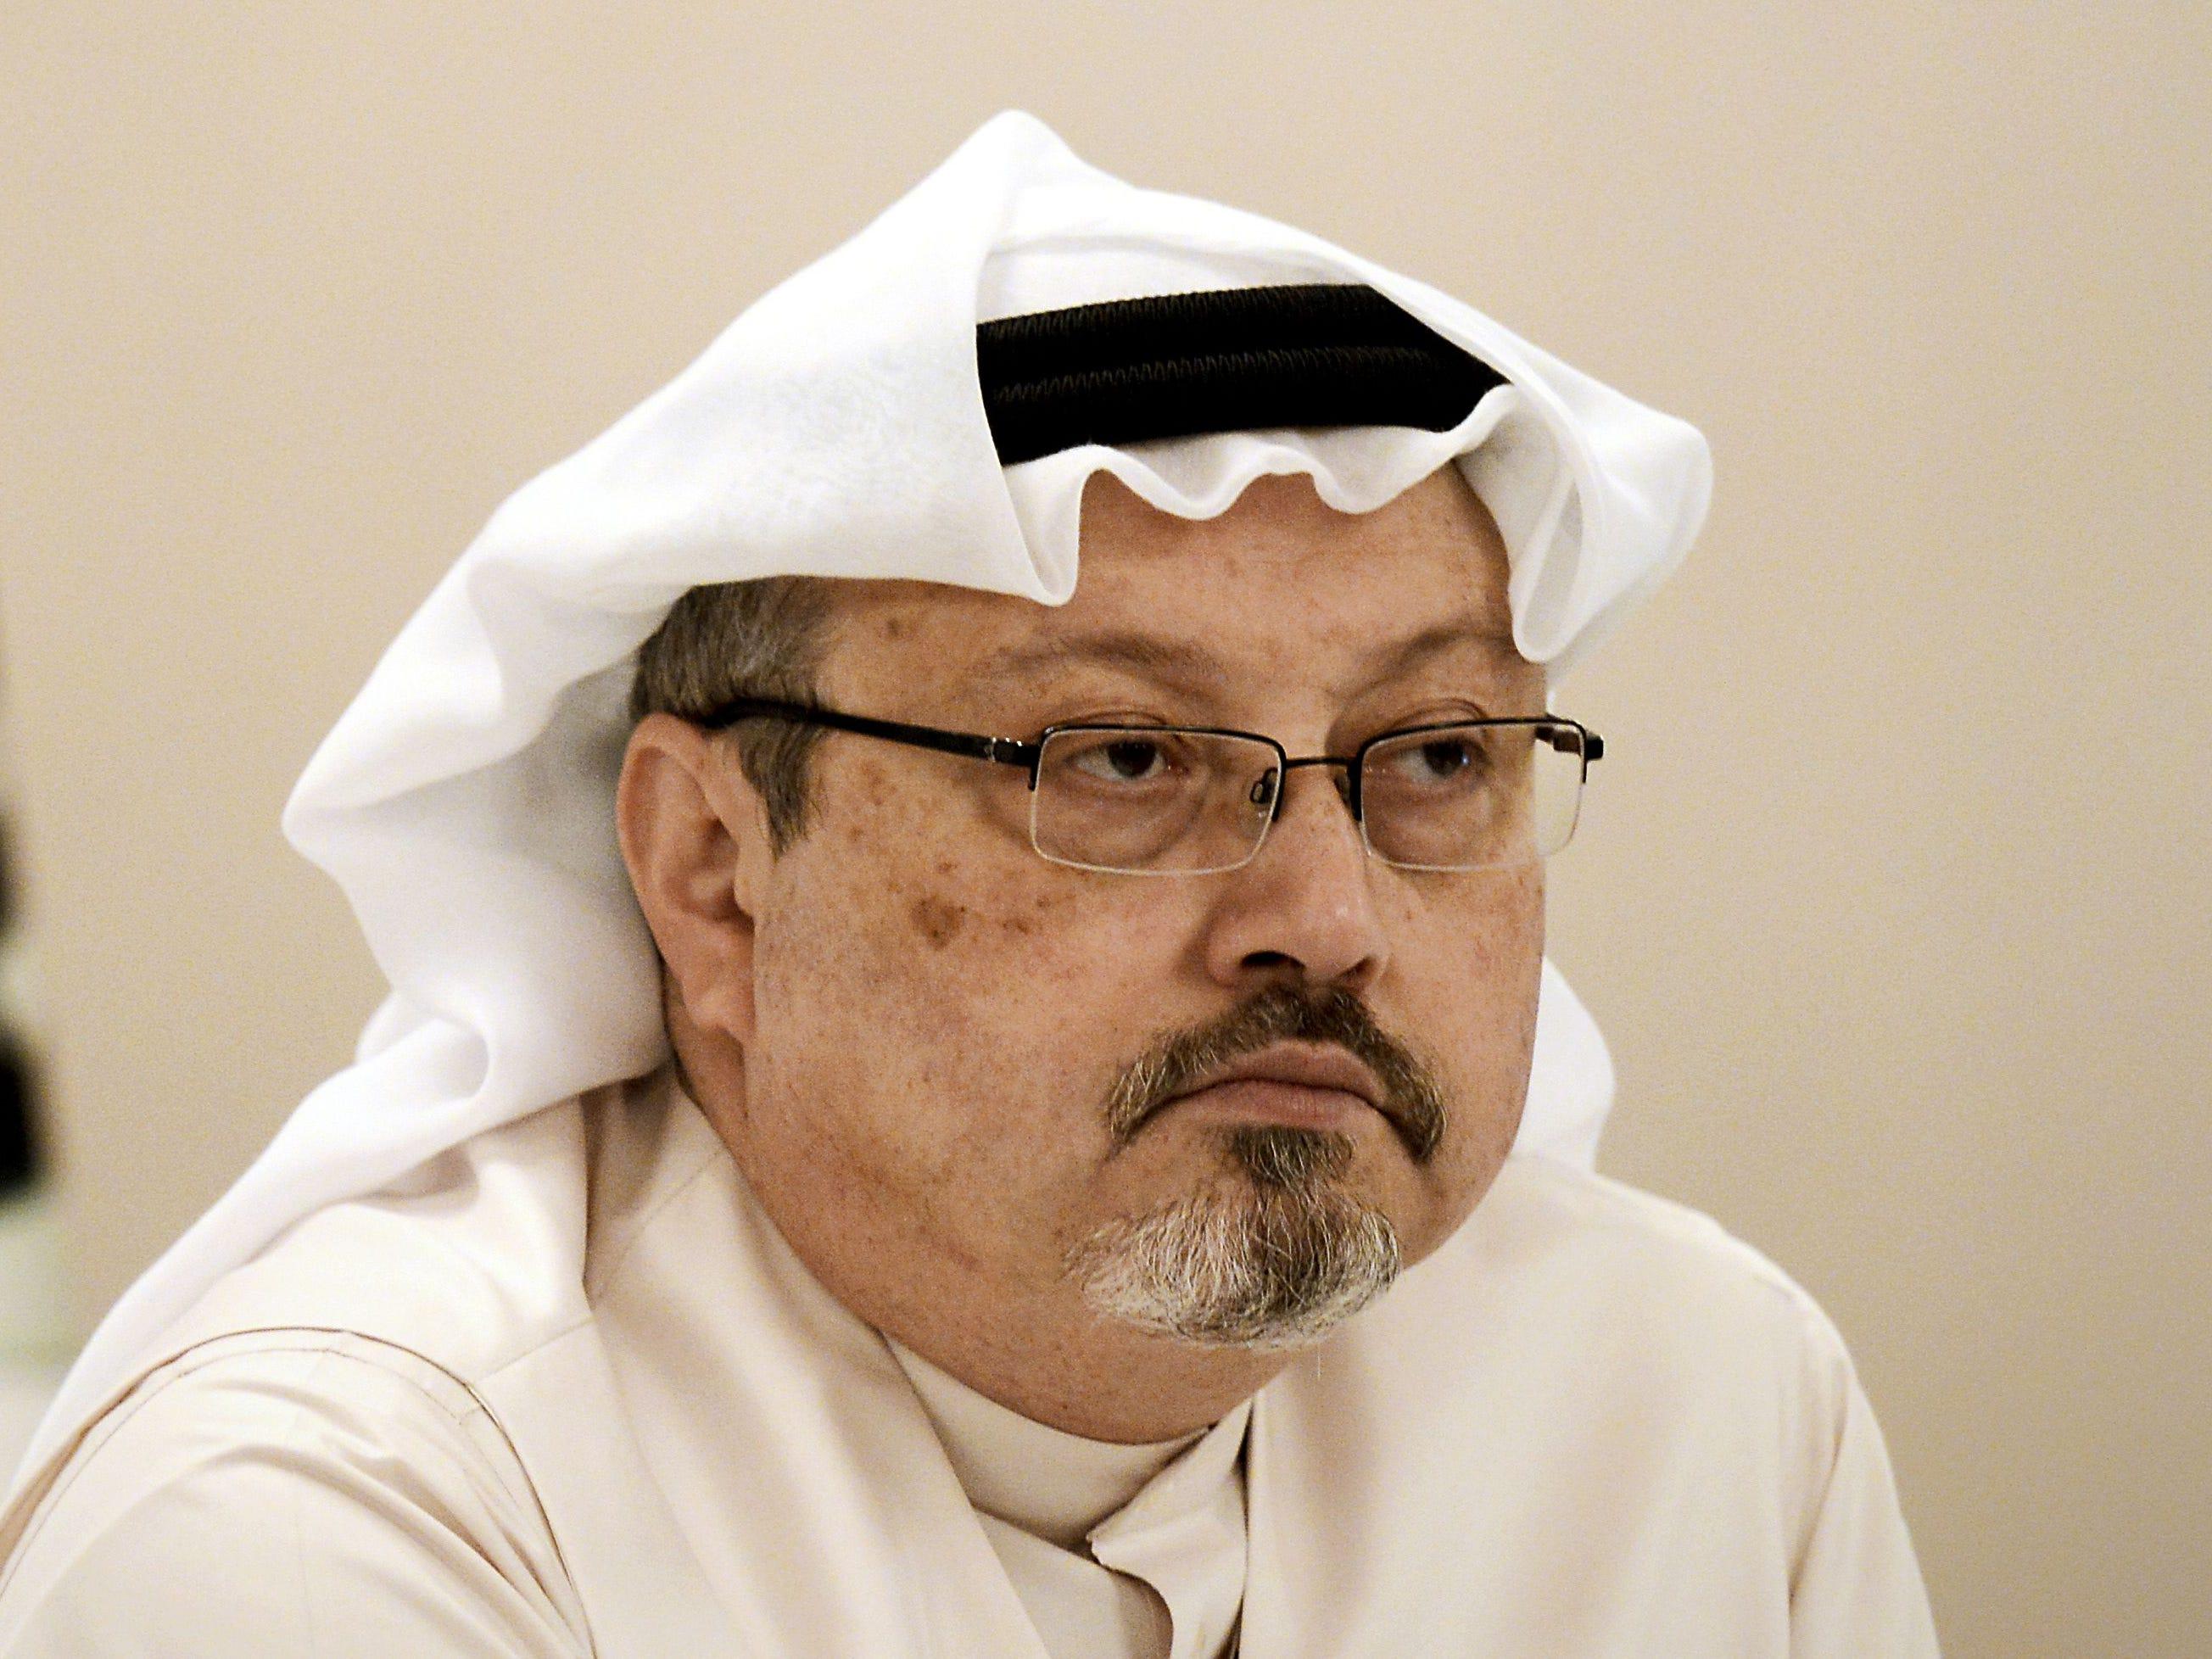 Trump: Report will confirm who caused Jamal Khashoggi's killing. CIA hasn't come to conclusion.